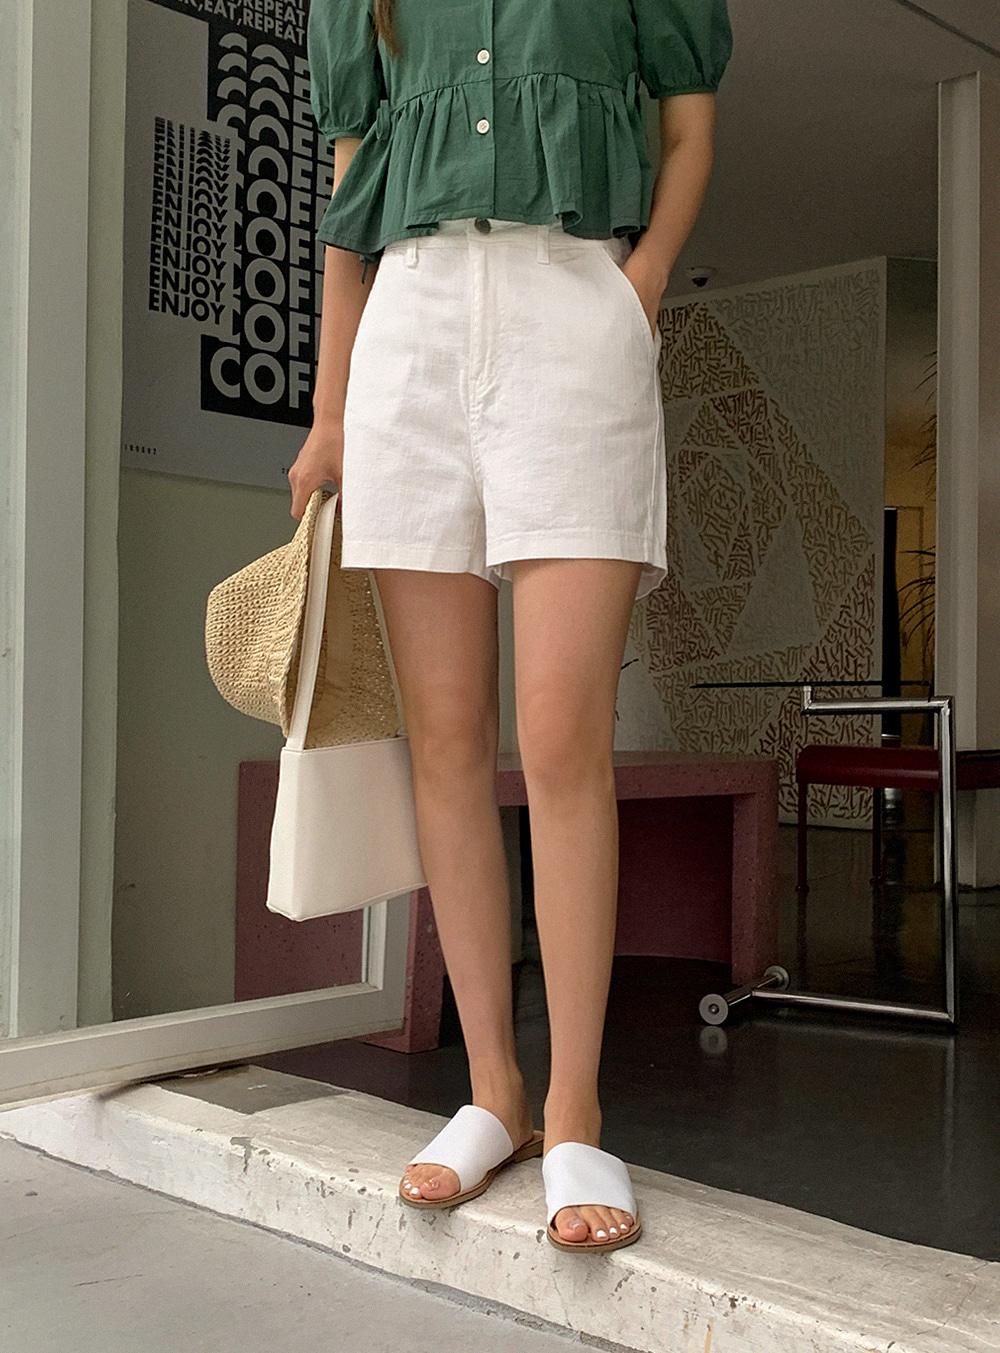 bentry half pants